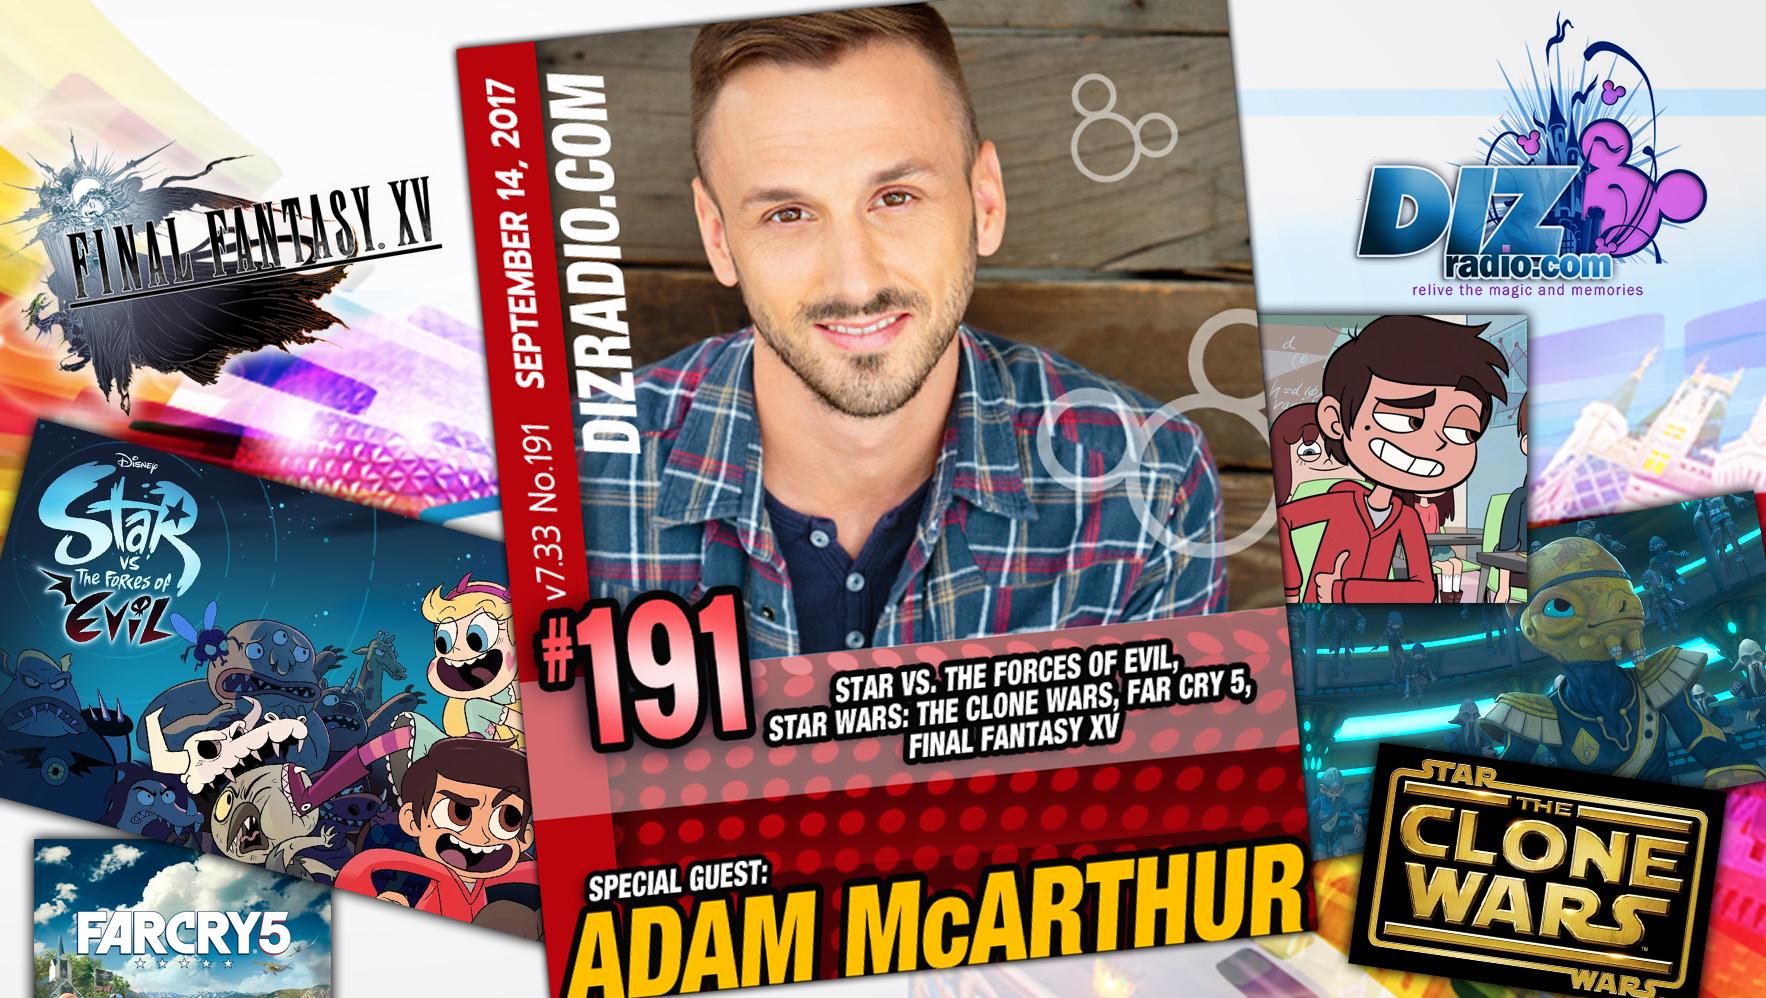 DisneyBlu's DizRadio Disney on Demand Podcast Show #191 w/ Special Guest: ADAM McARTHUR (Star Vs. The Forces of Evil, Star Wars The Clone Wars, Far Cry 5, Final Fantasy XV)